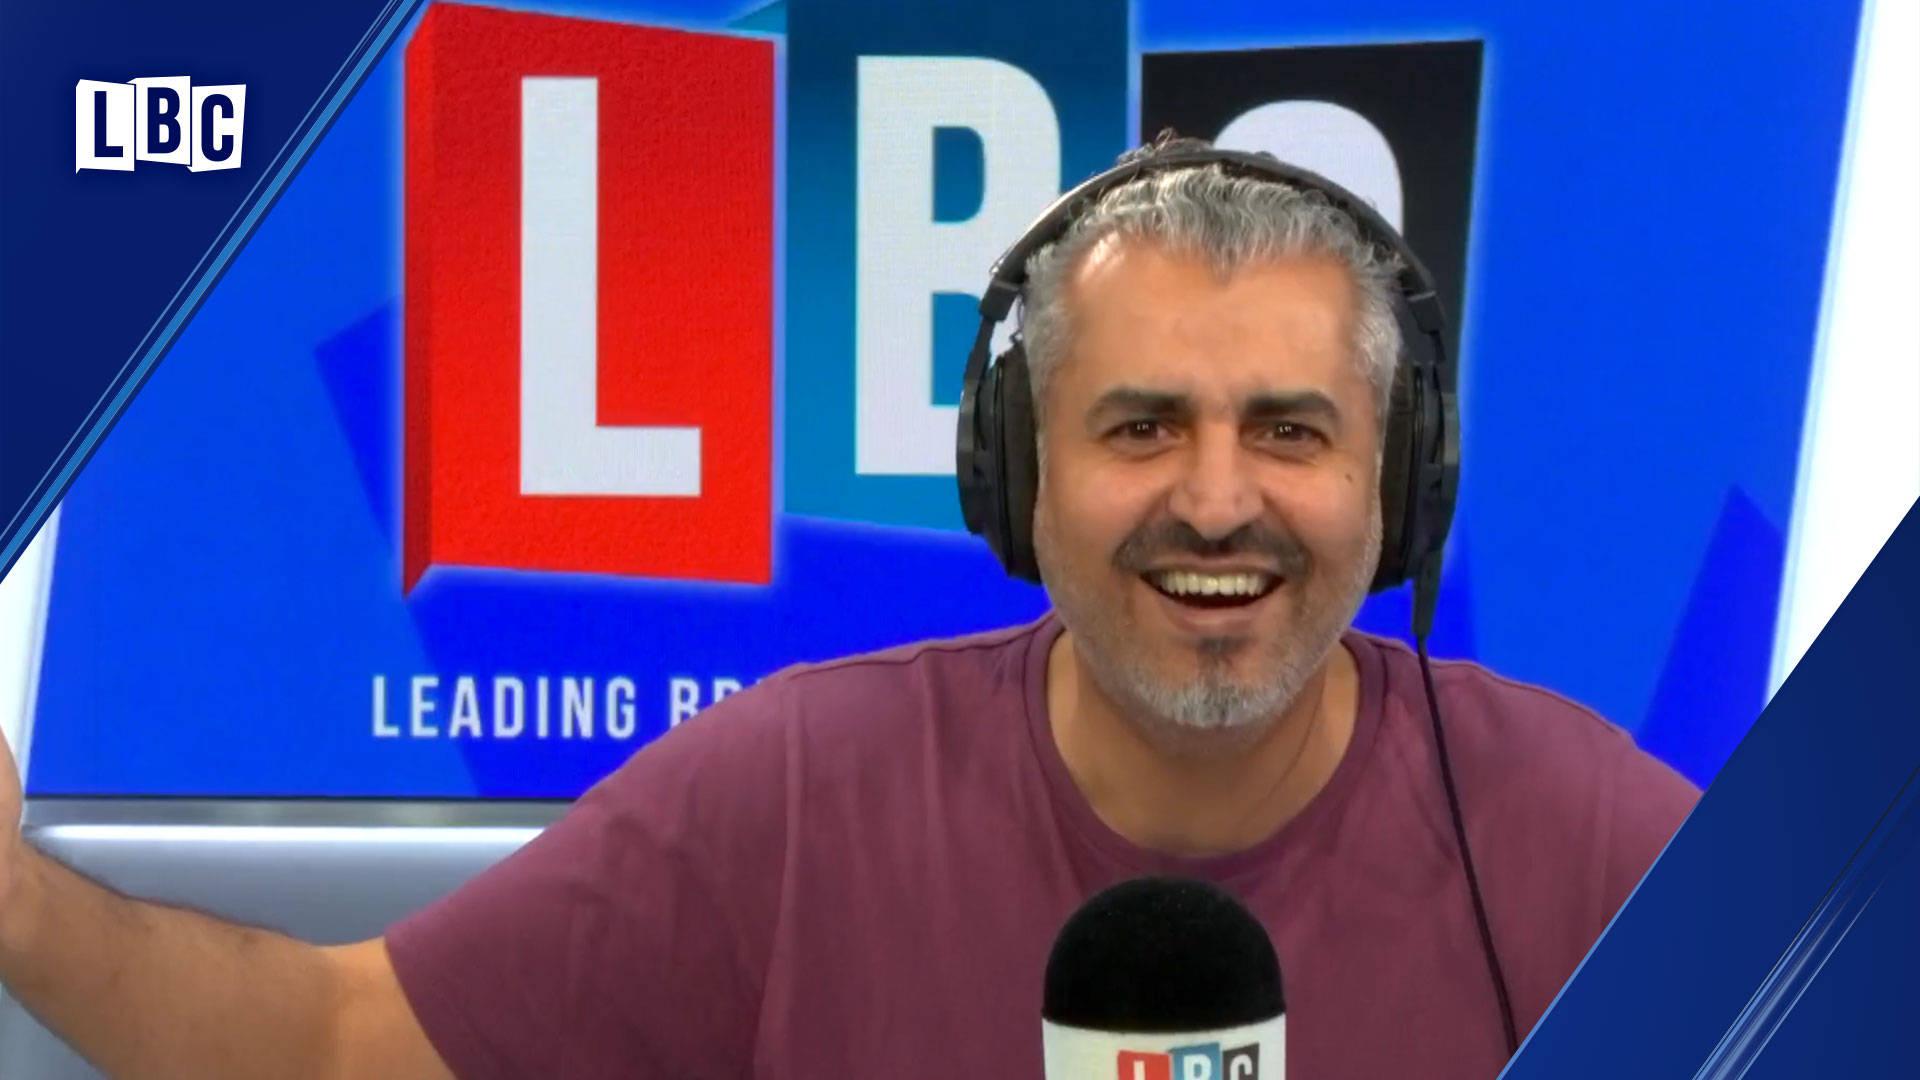 Maajid Nawaz takes down caller who said Hamas are not terrorists